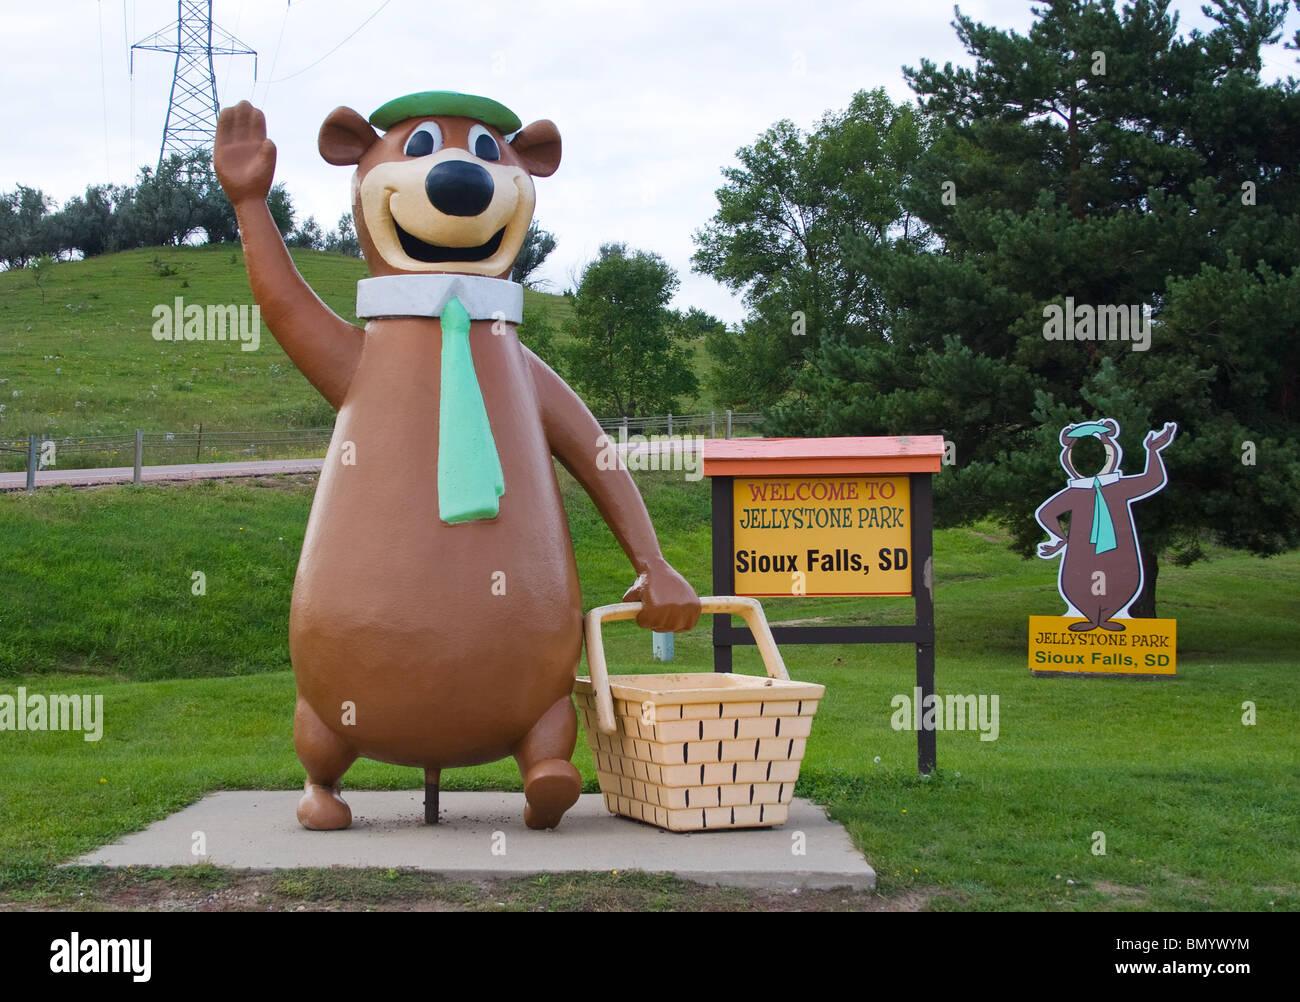 Yogi Bear Waving At The Jellystone Park In Sioux Falls South Dakota Stock Photo Alamy